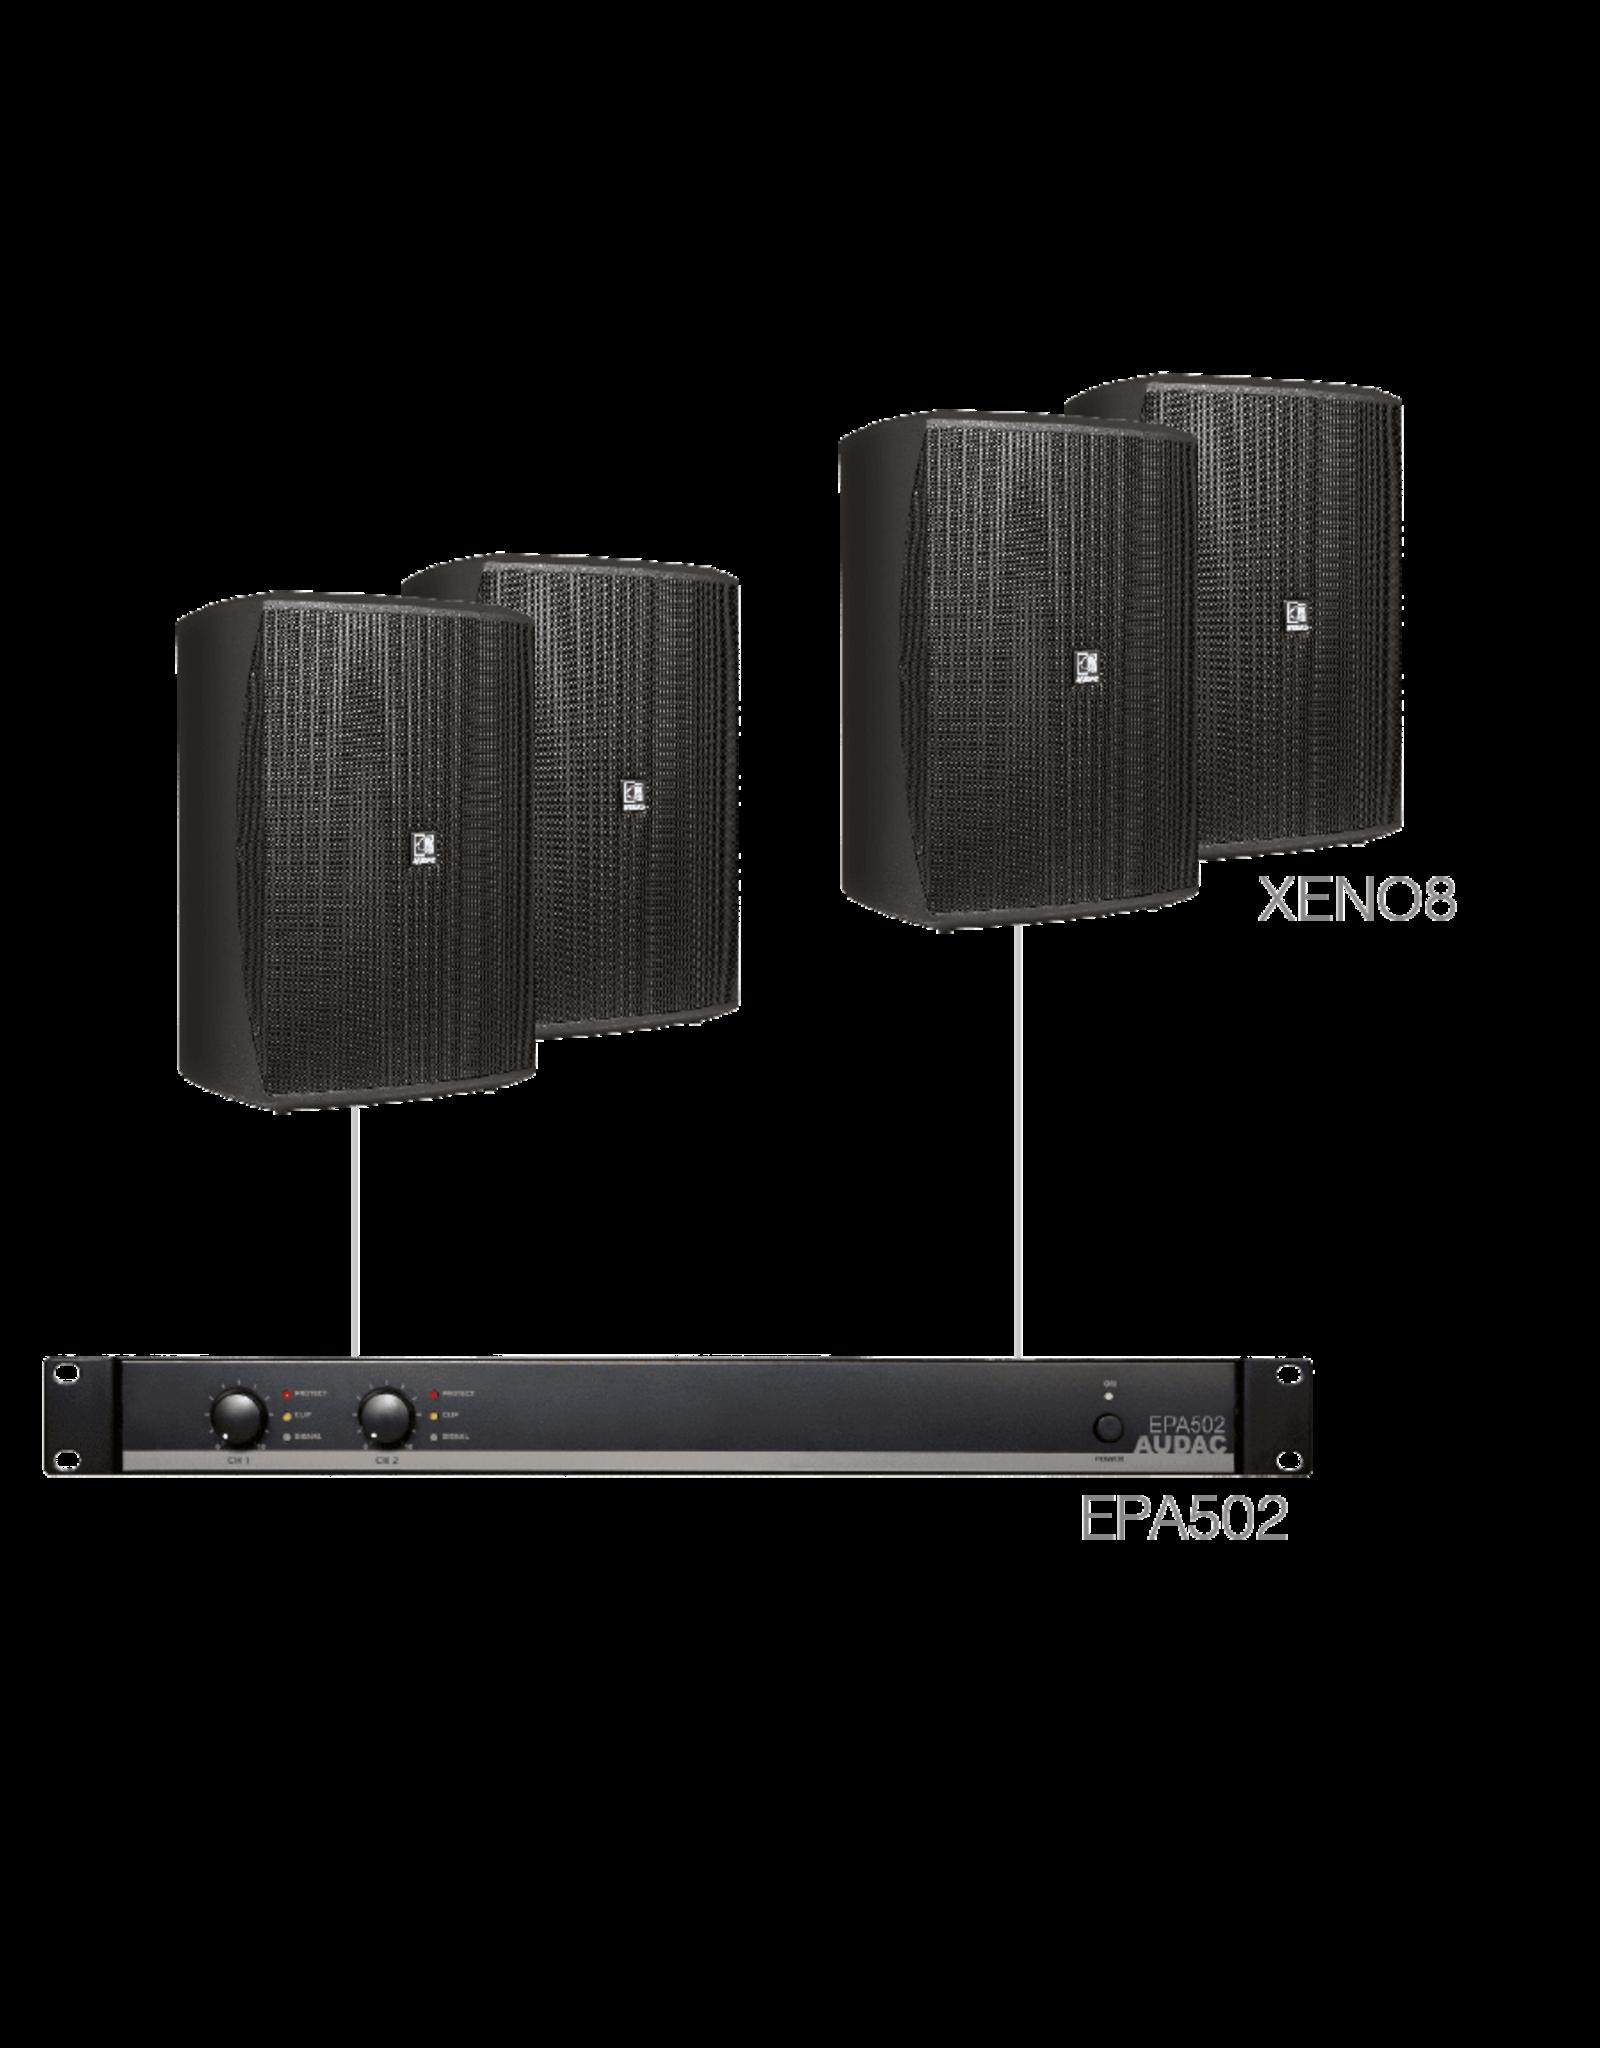 Audac 4 x XENO8 + EPA502 Black